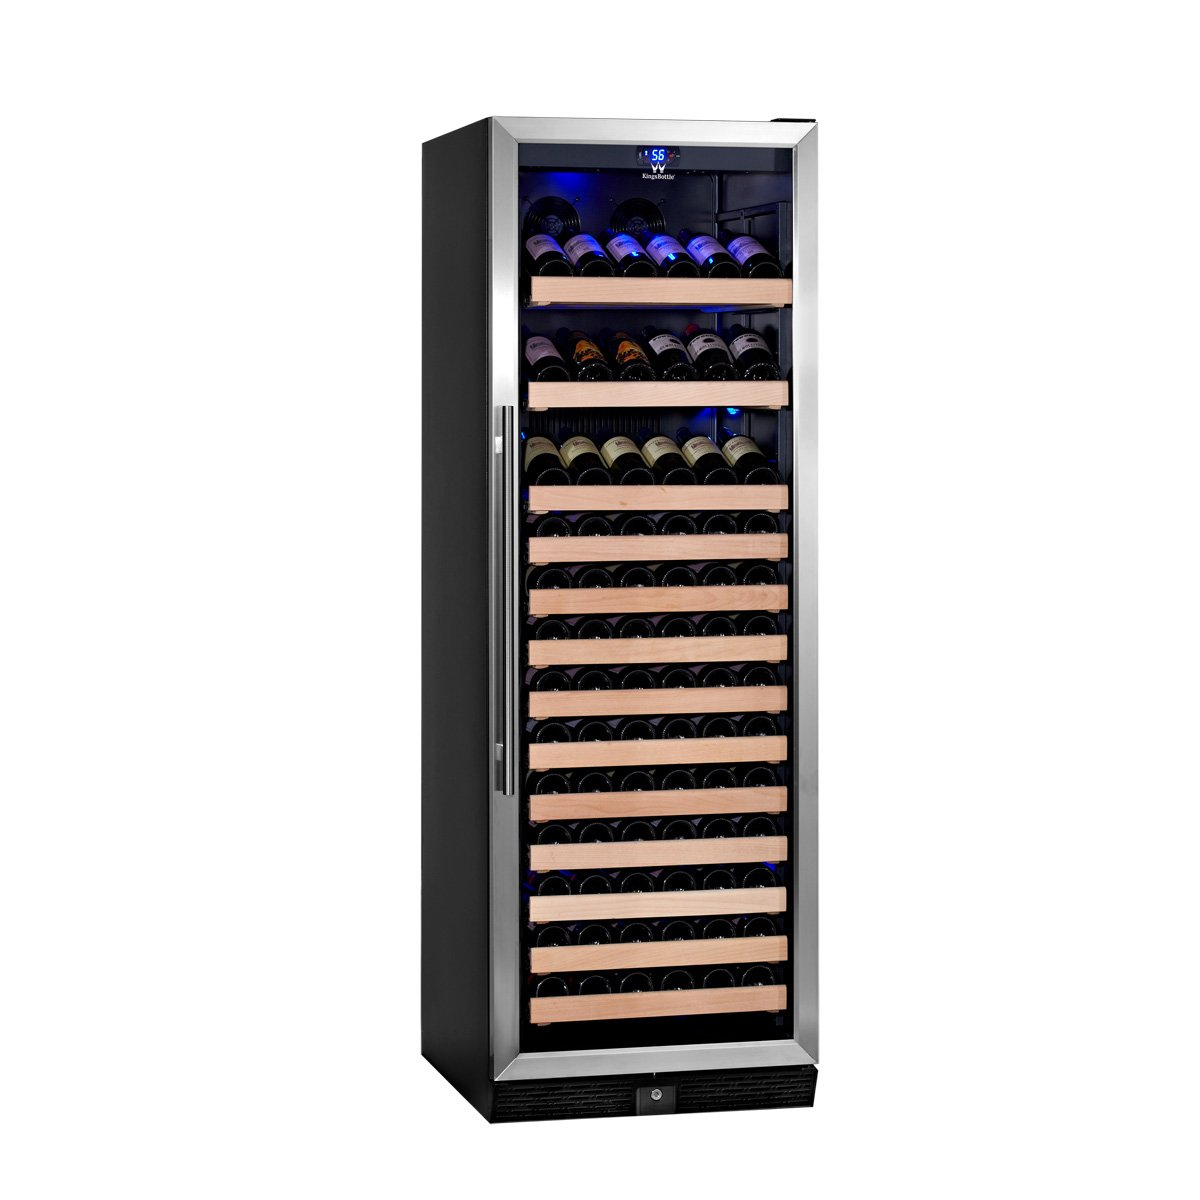 KingsBottle 131 Bottle Single Zone Wine Cooler, Stainless Steel with Glass Door by KingsBottle